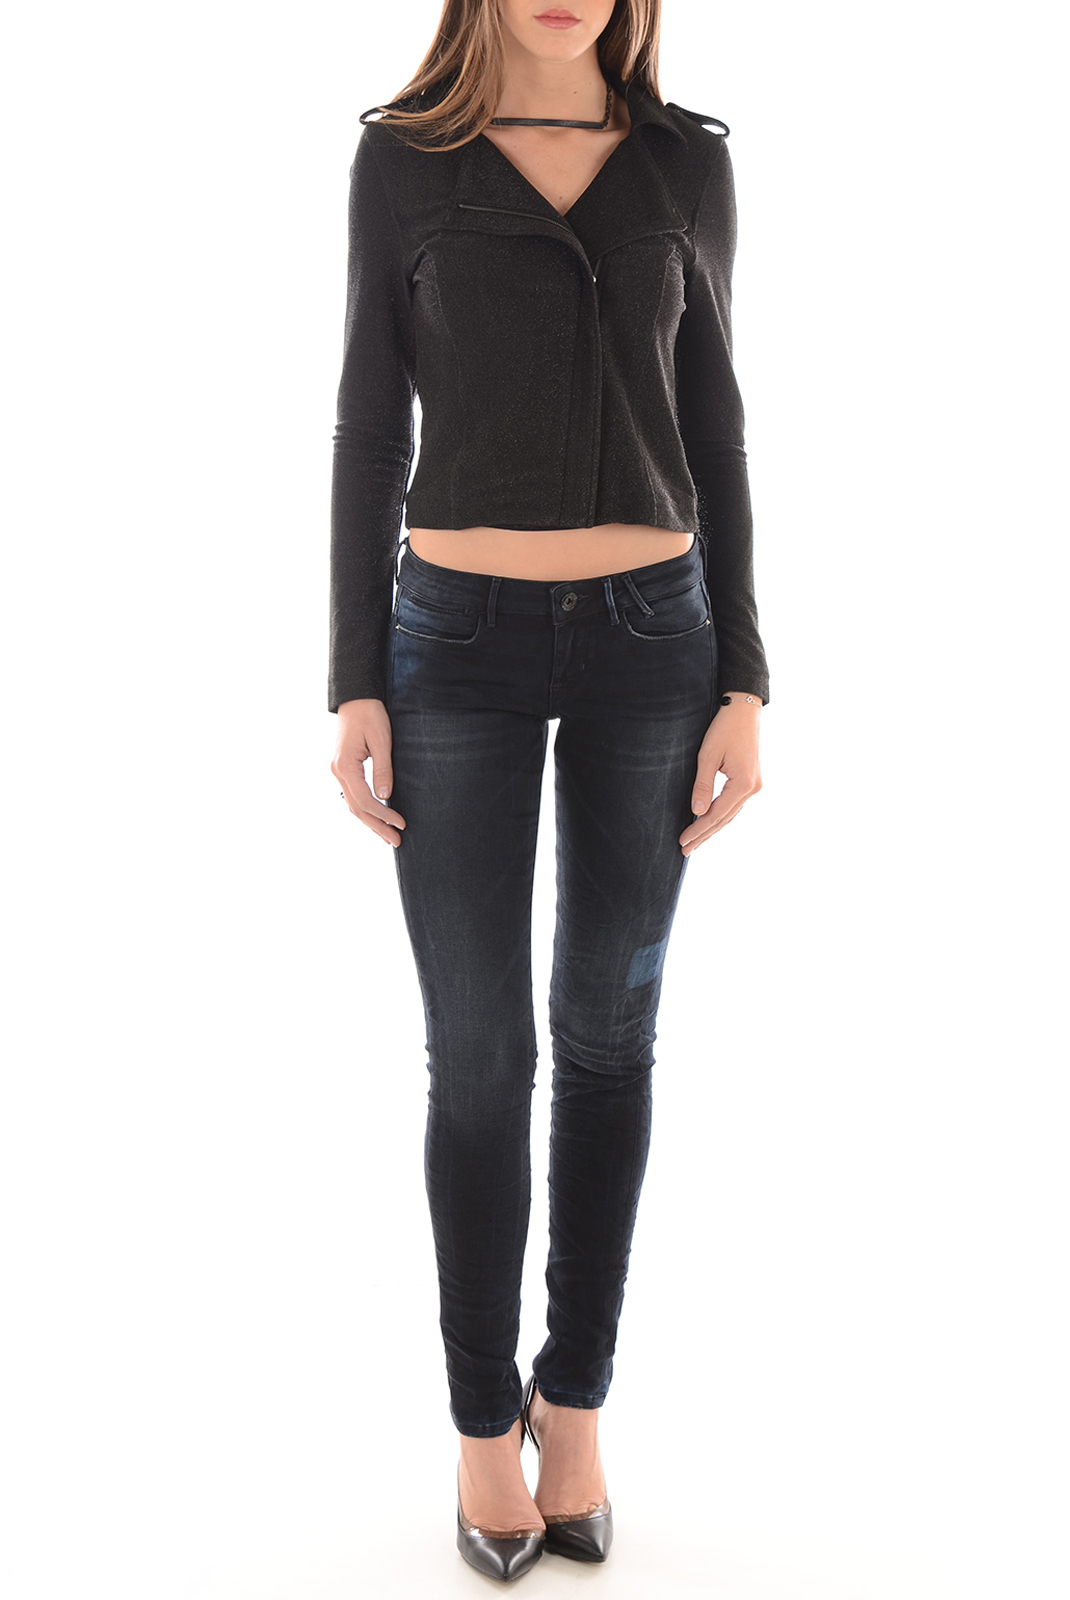 Vestes & blousons  Vero moda LOLA LS BIKER JACKET BLACK/BLACK